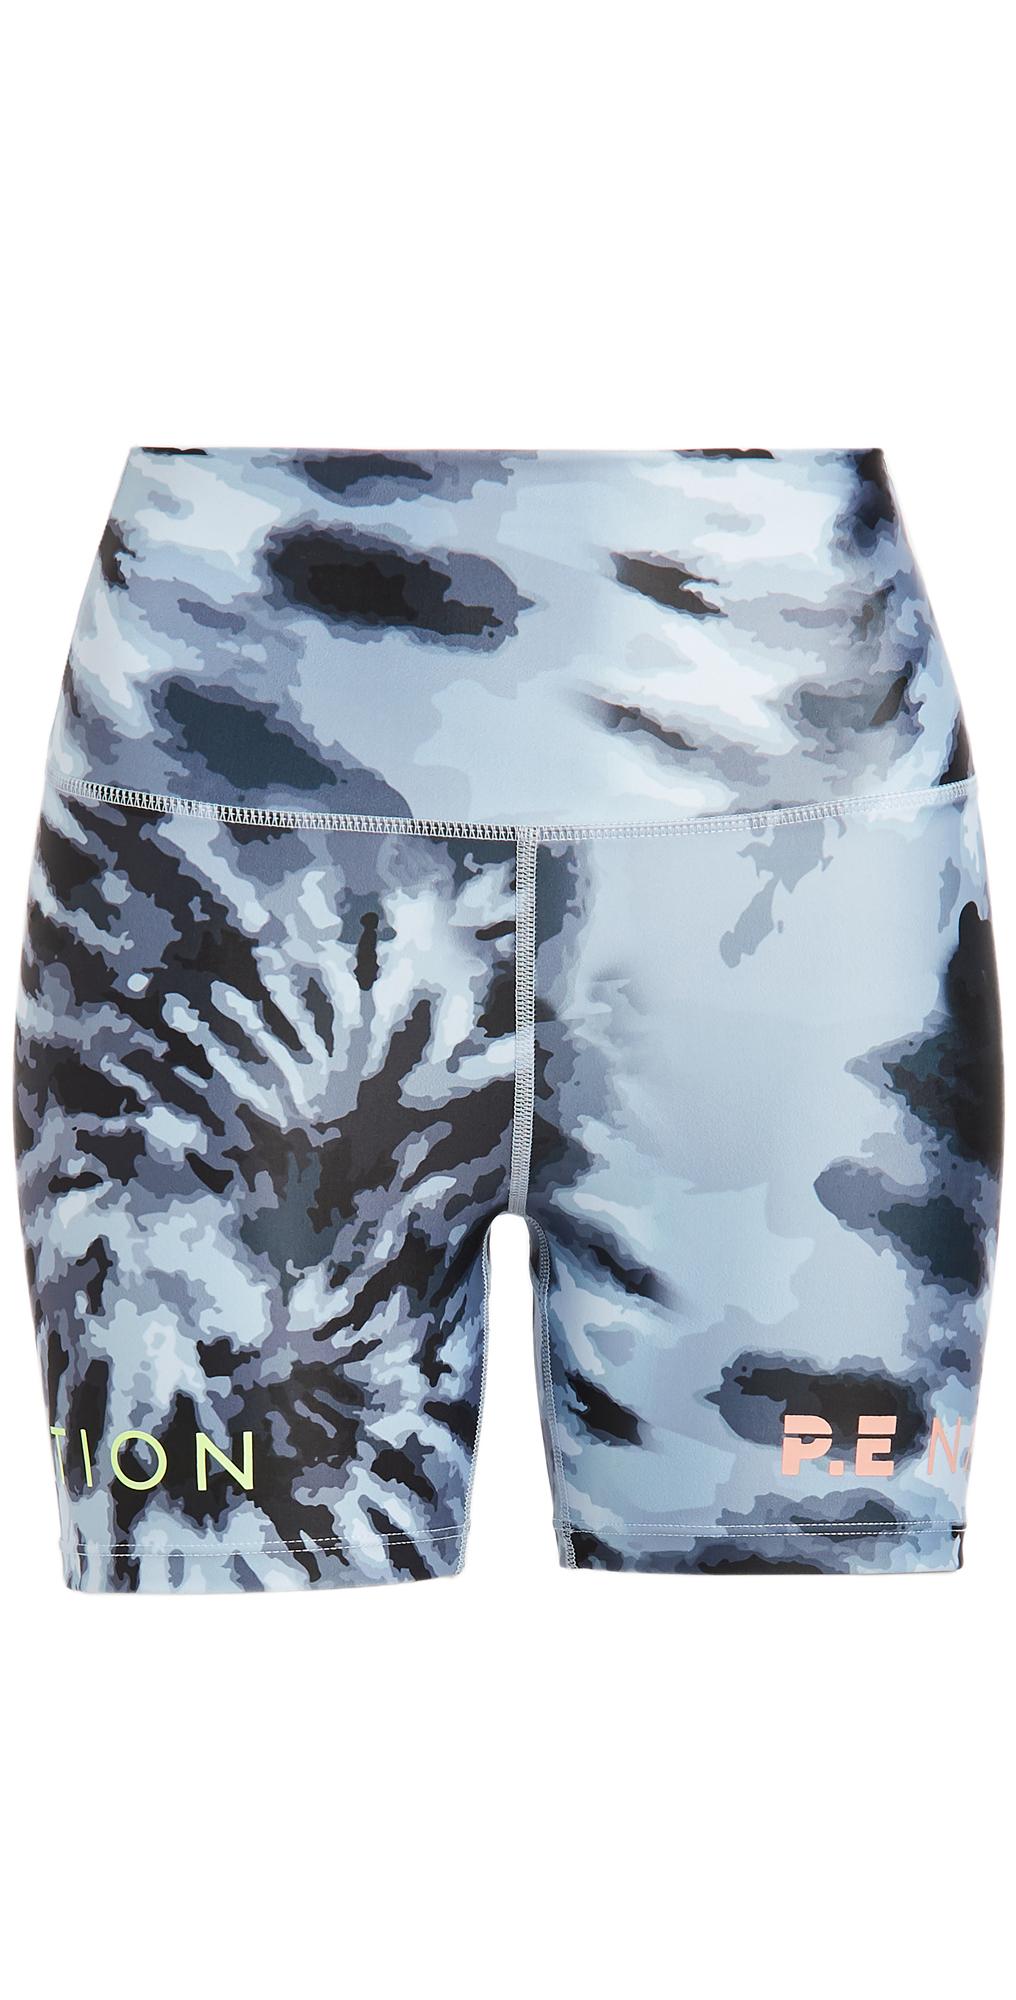 P.E NATION Top Spin Shorts